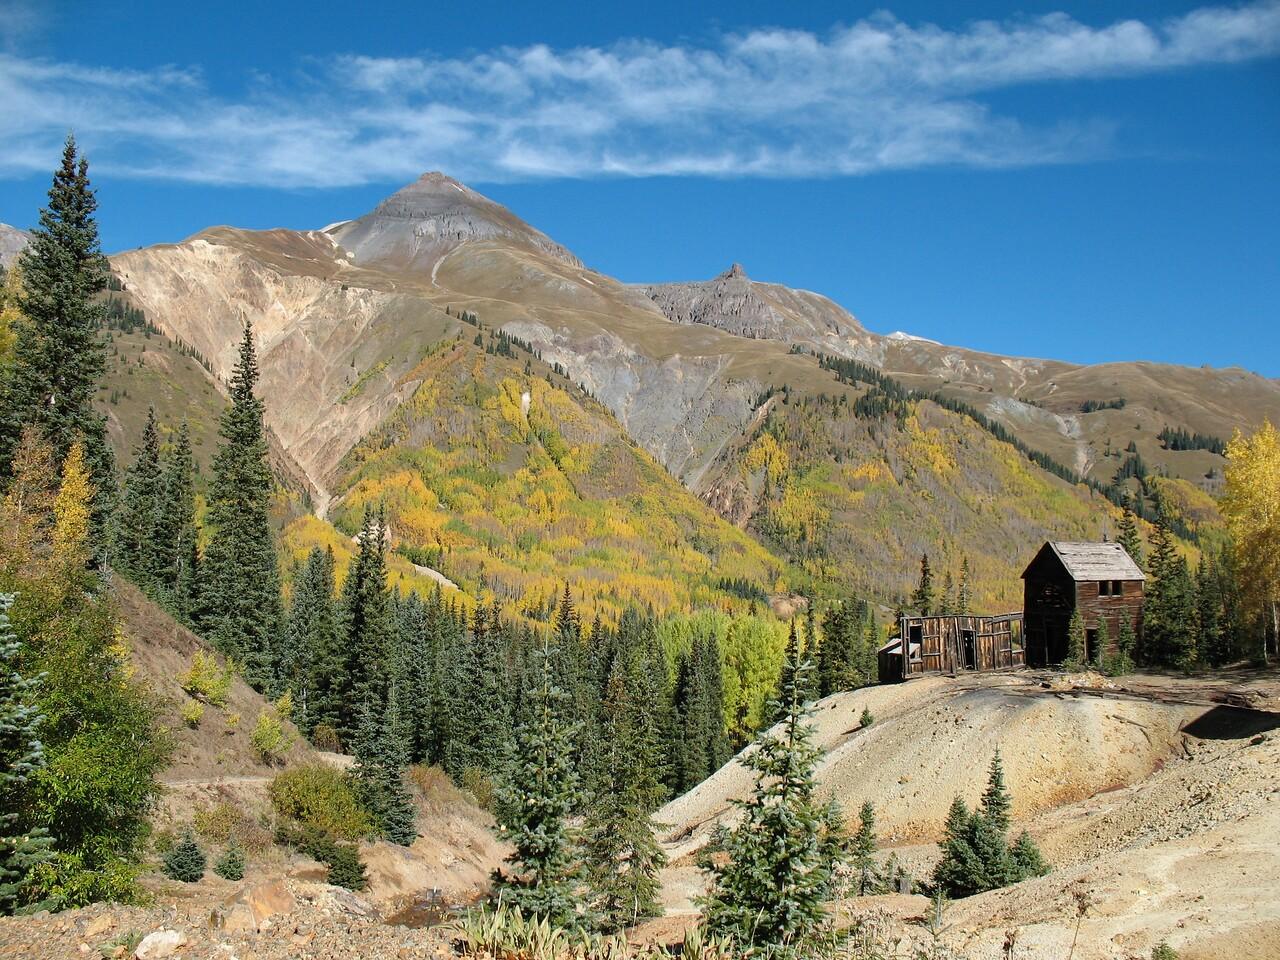 The Guston Mine